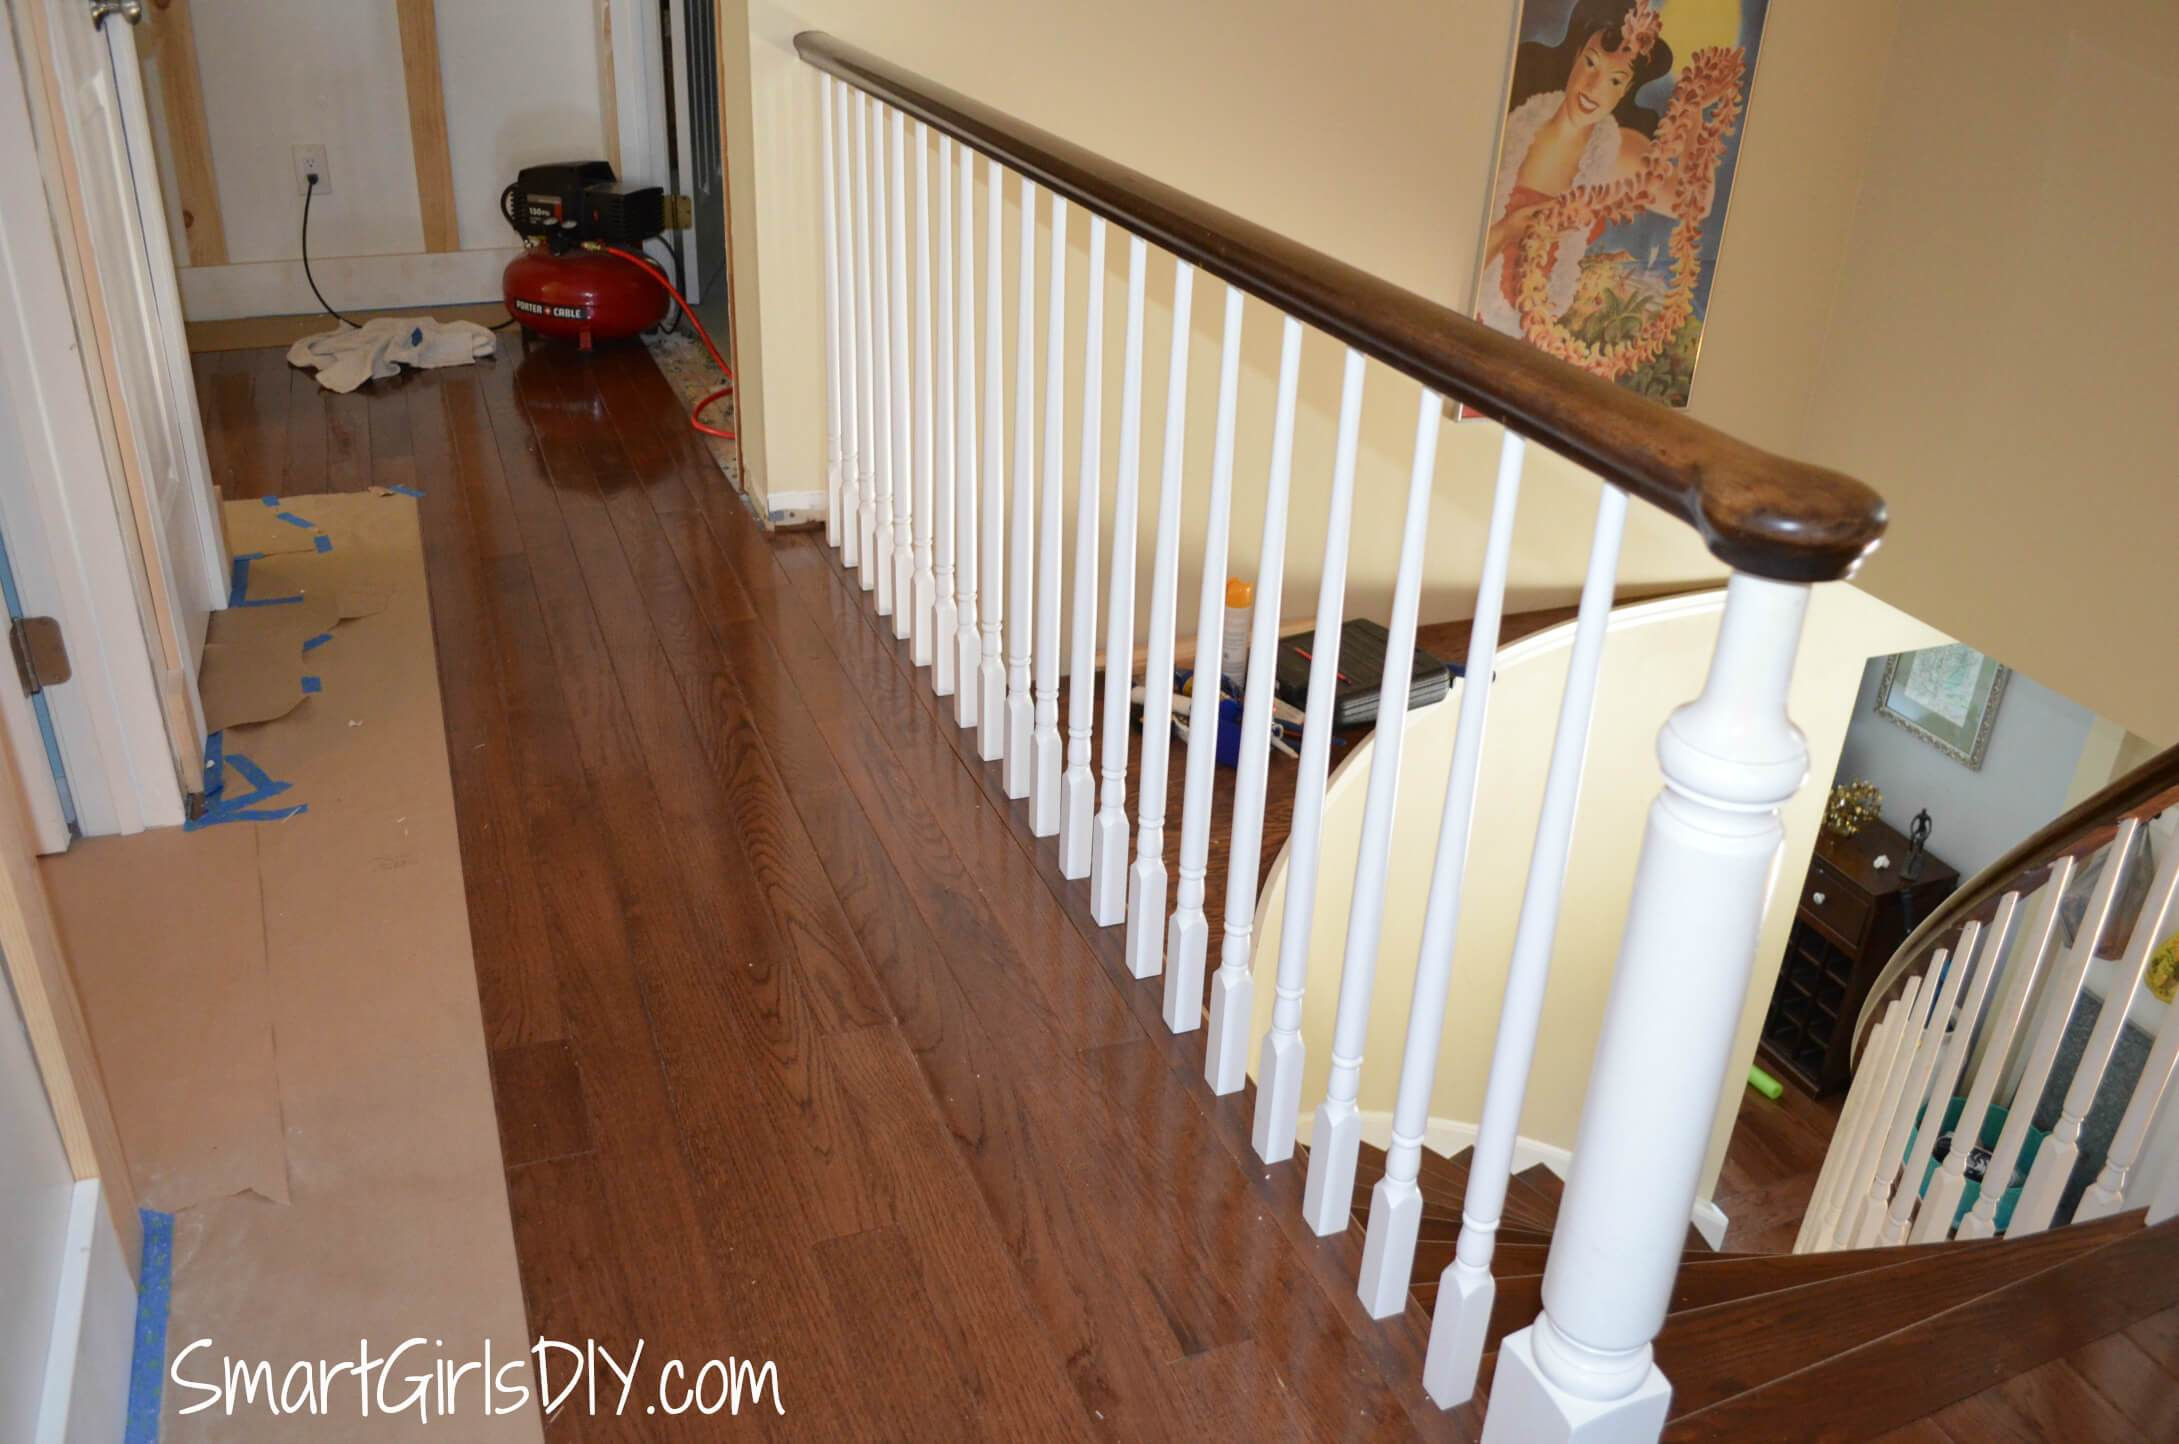 is carpet cheaper than hardwood floors of upstairs hallway 1 installing hardwood floors inside upstairs hallway 2 hardwood spindles